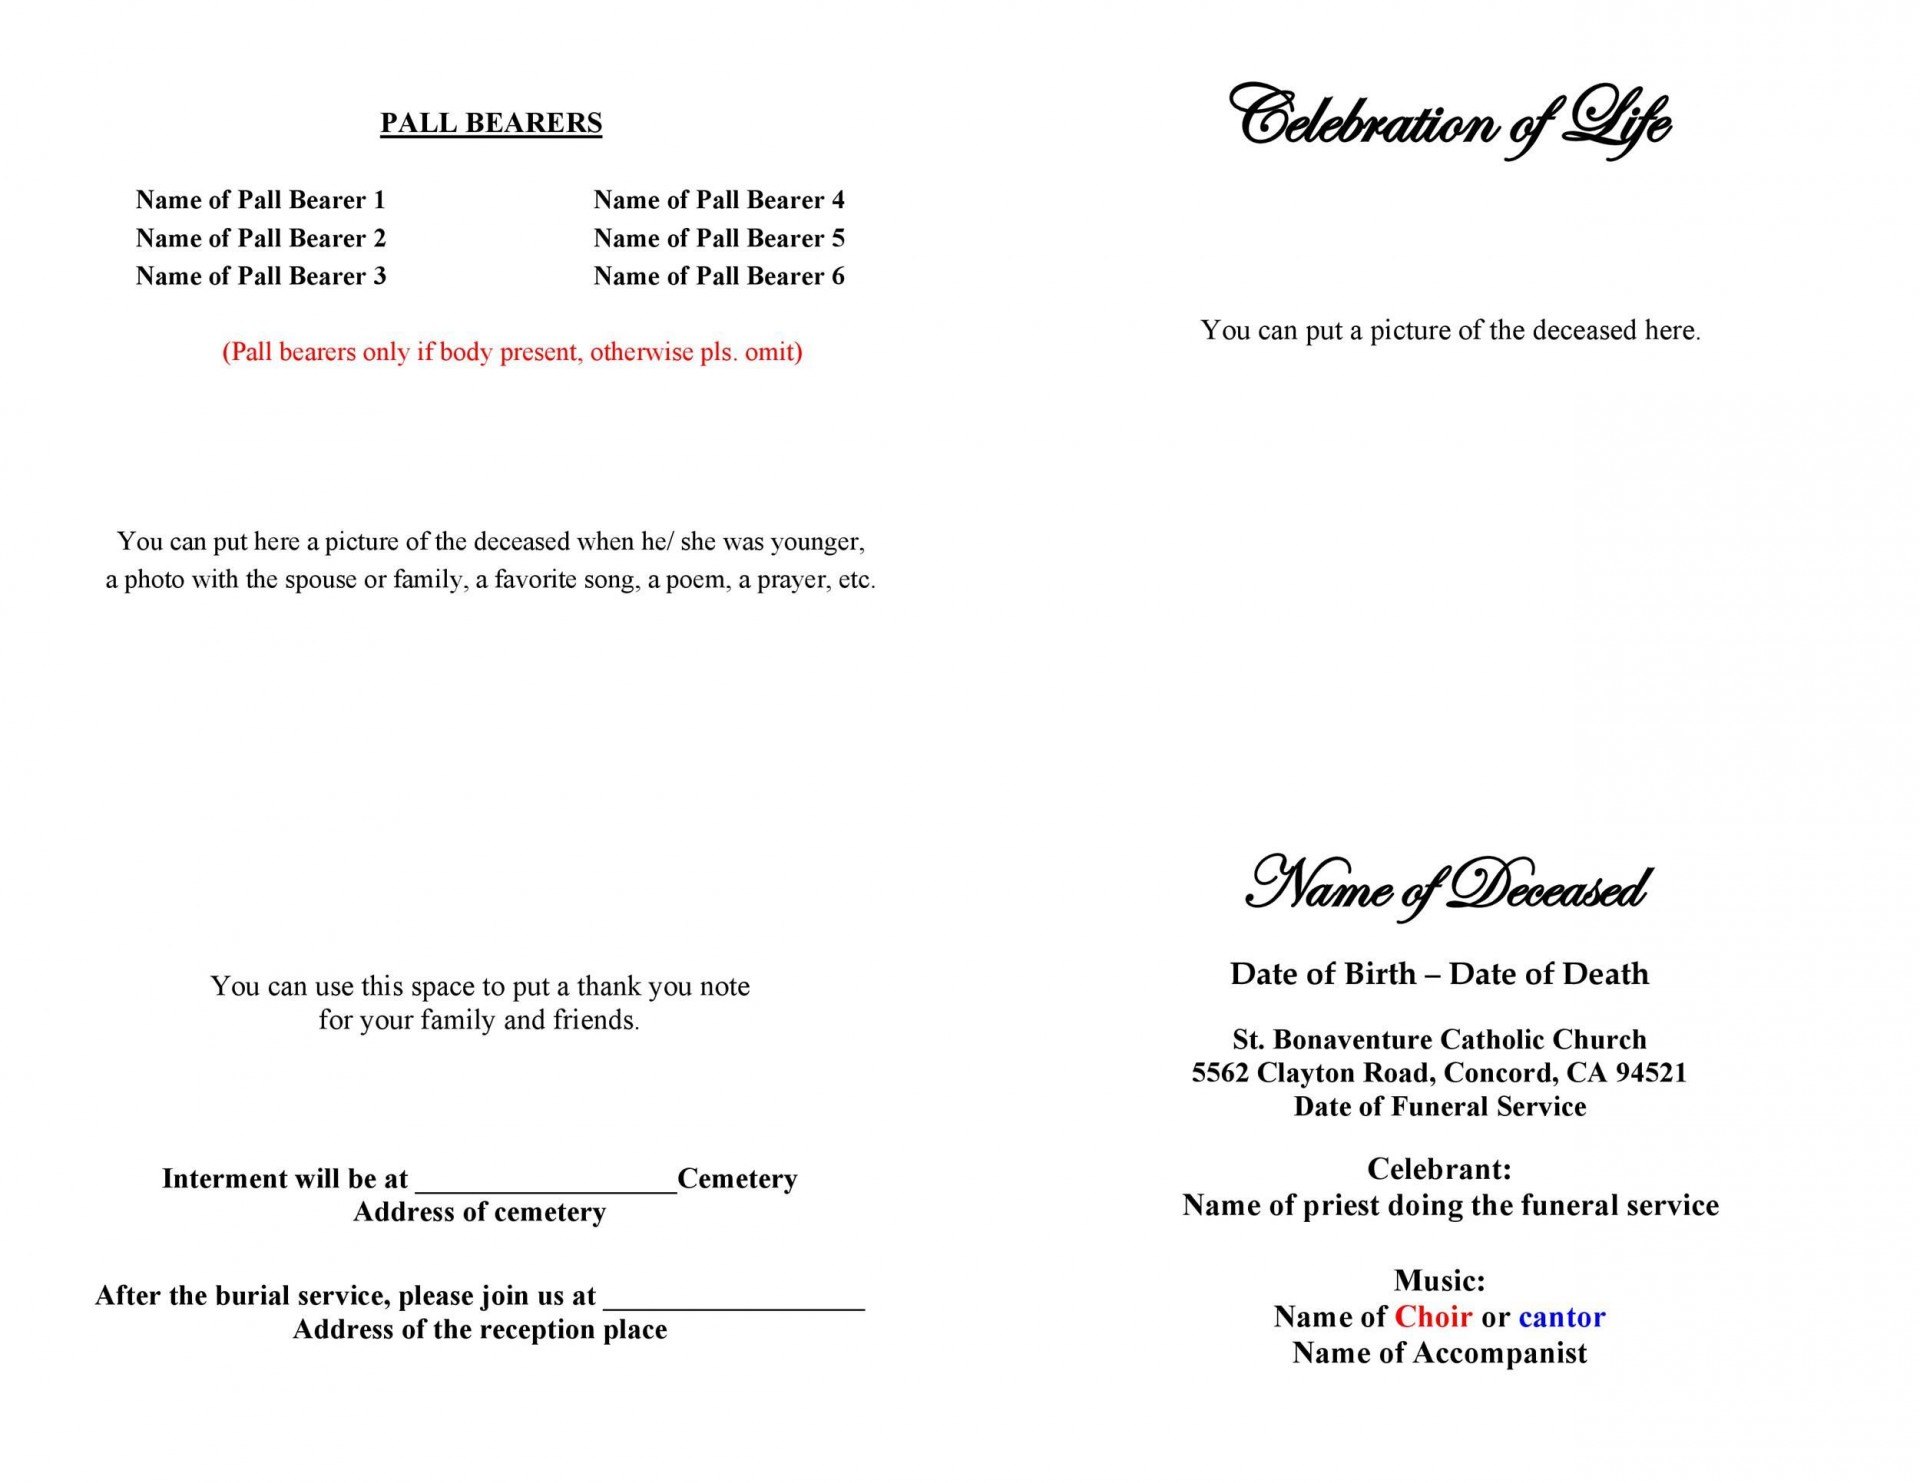 007 Rare Celebration Of Life Program Template Free Image  Word1920